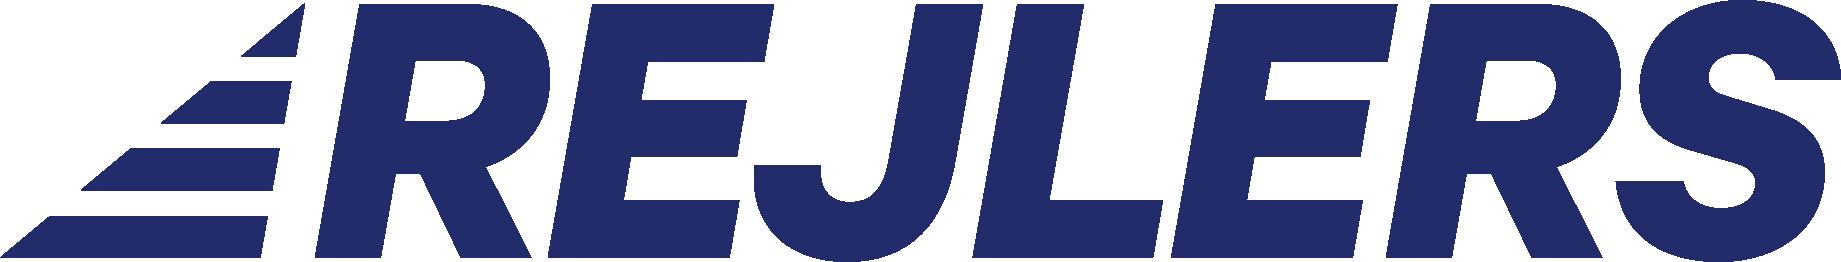 Rejlers logo png